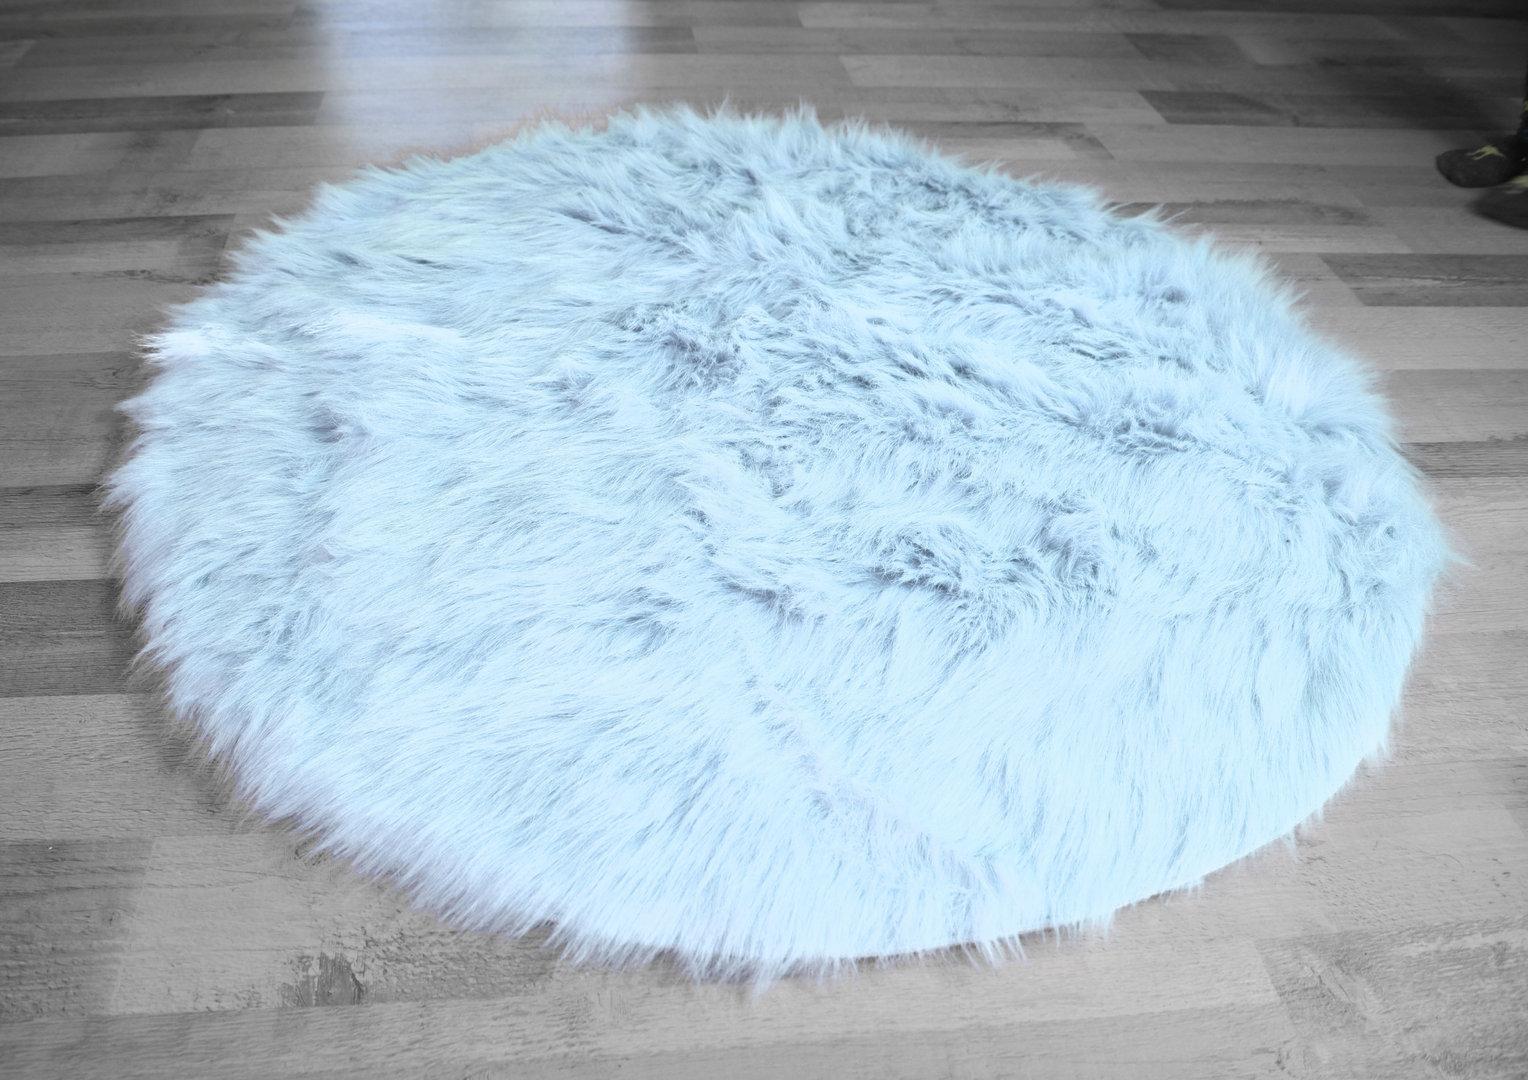 hellblauer teppich annette frank teppich hellblau x cm with hellblauer teppich amazing teppich. Black Bedroom Furniture Sets. Home Design Ideas